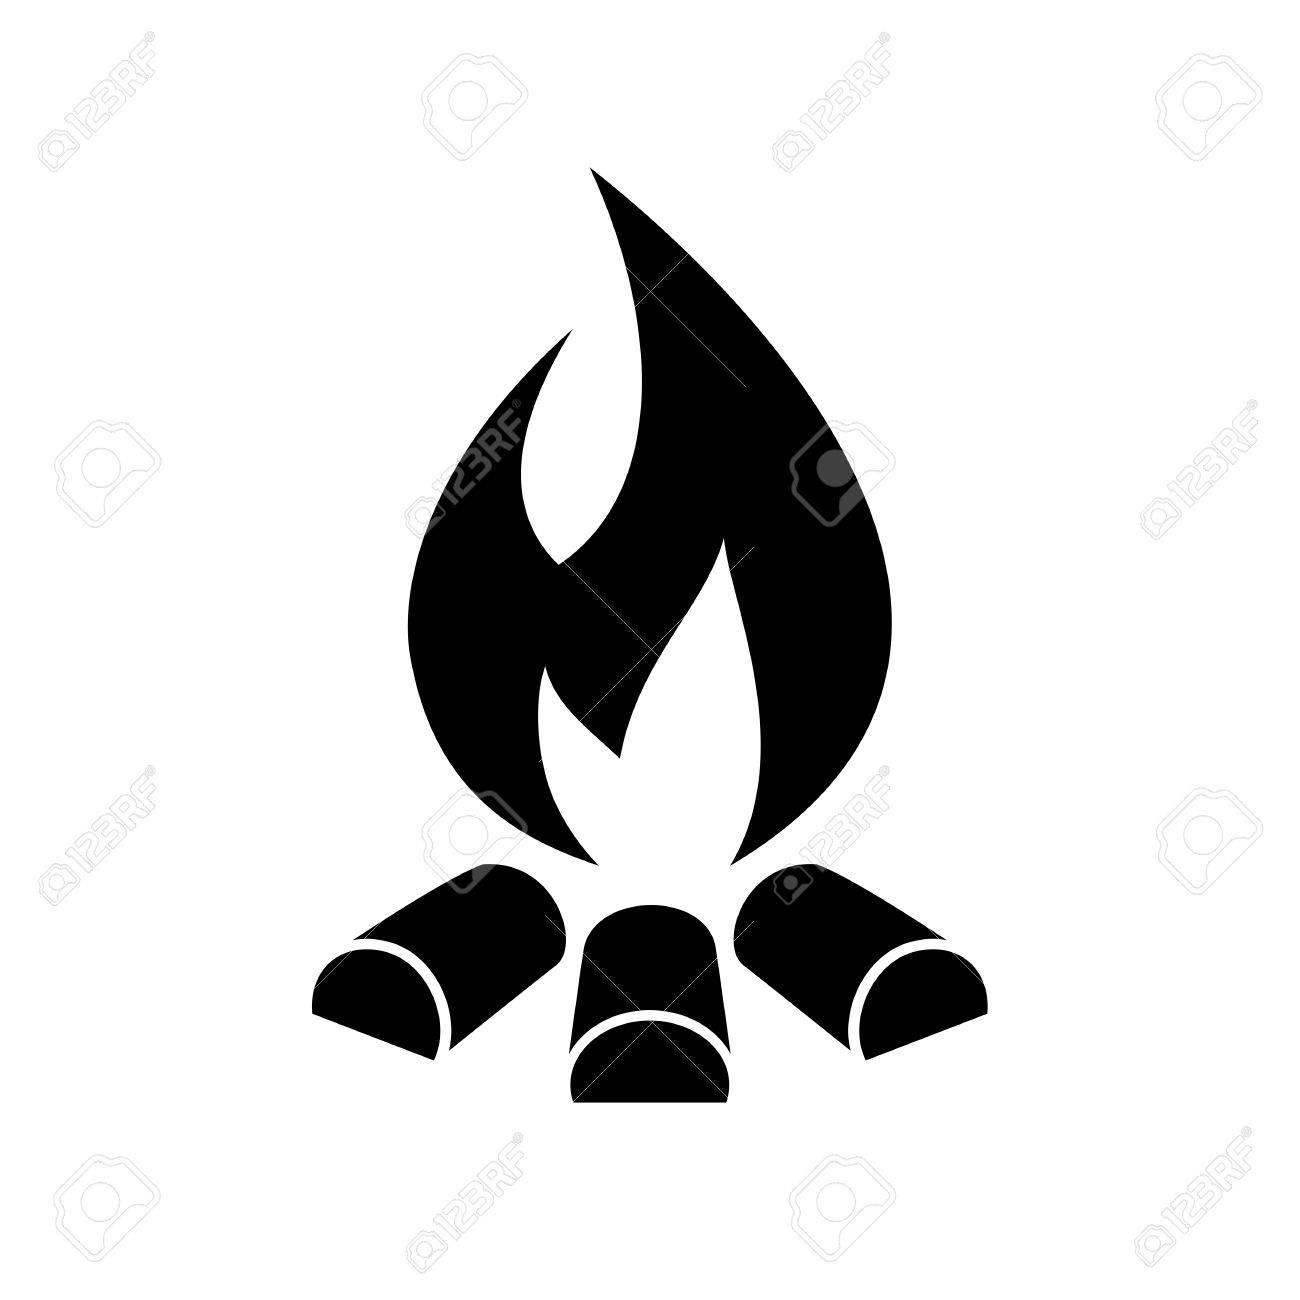 campfire vector icon royalty free cliparts vectors and stock rh 123rf com campfire vector art campfire vector clipart